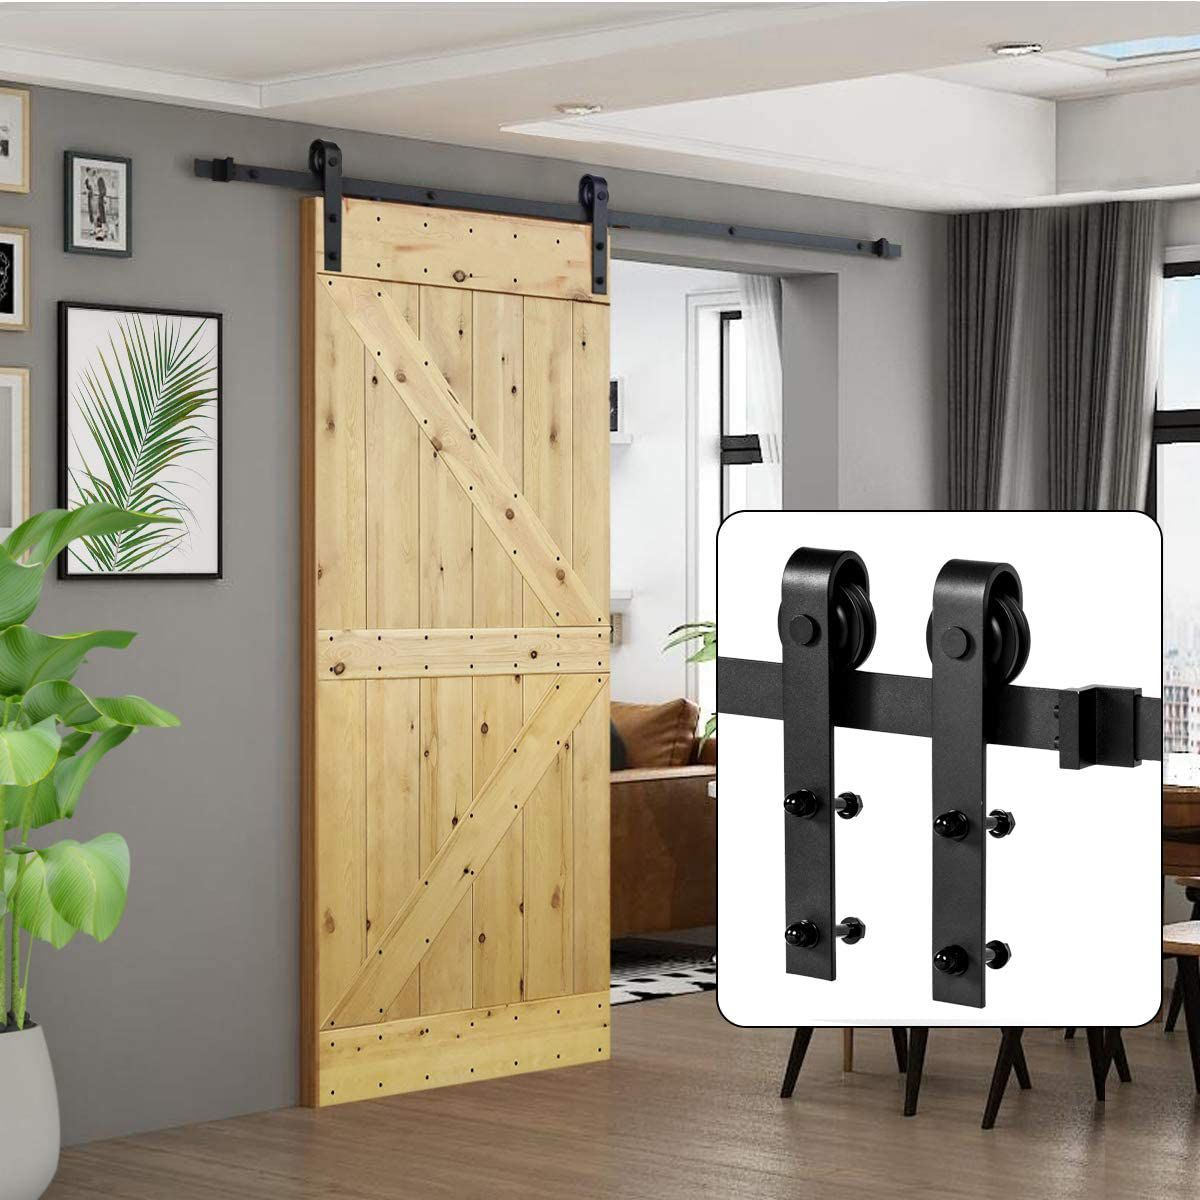 U-MAX 6.6 FT Sliding Barn Wood Door Basic Sliding Track Hardware Kit